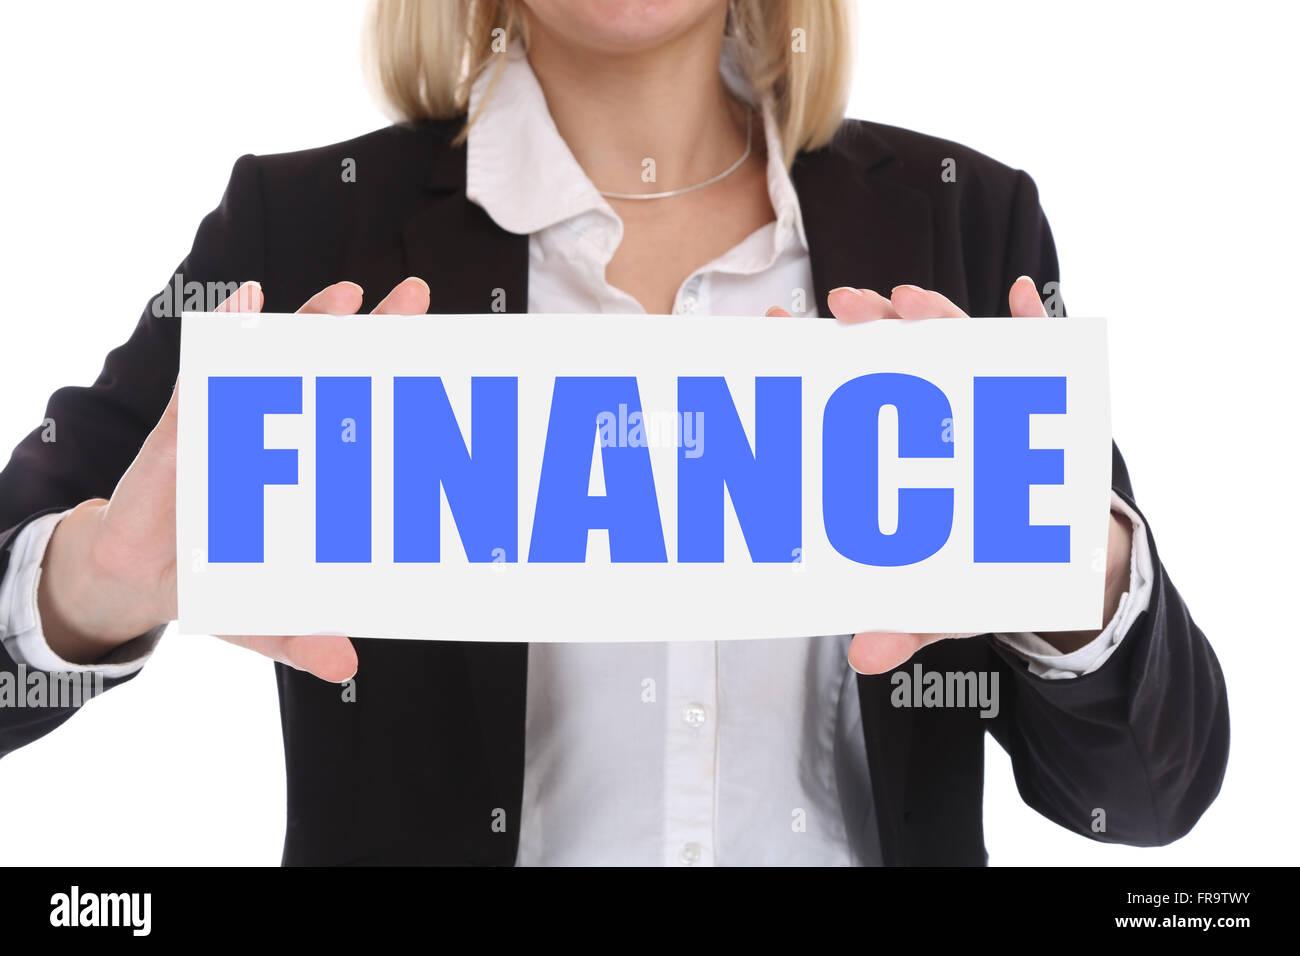 Finance financial finances money business concept investment - Stock Image